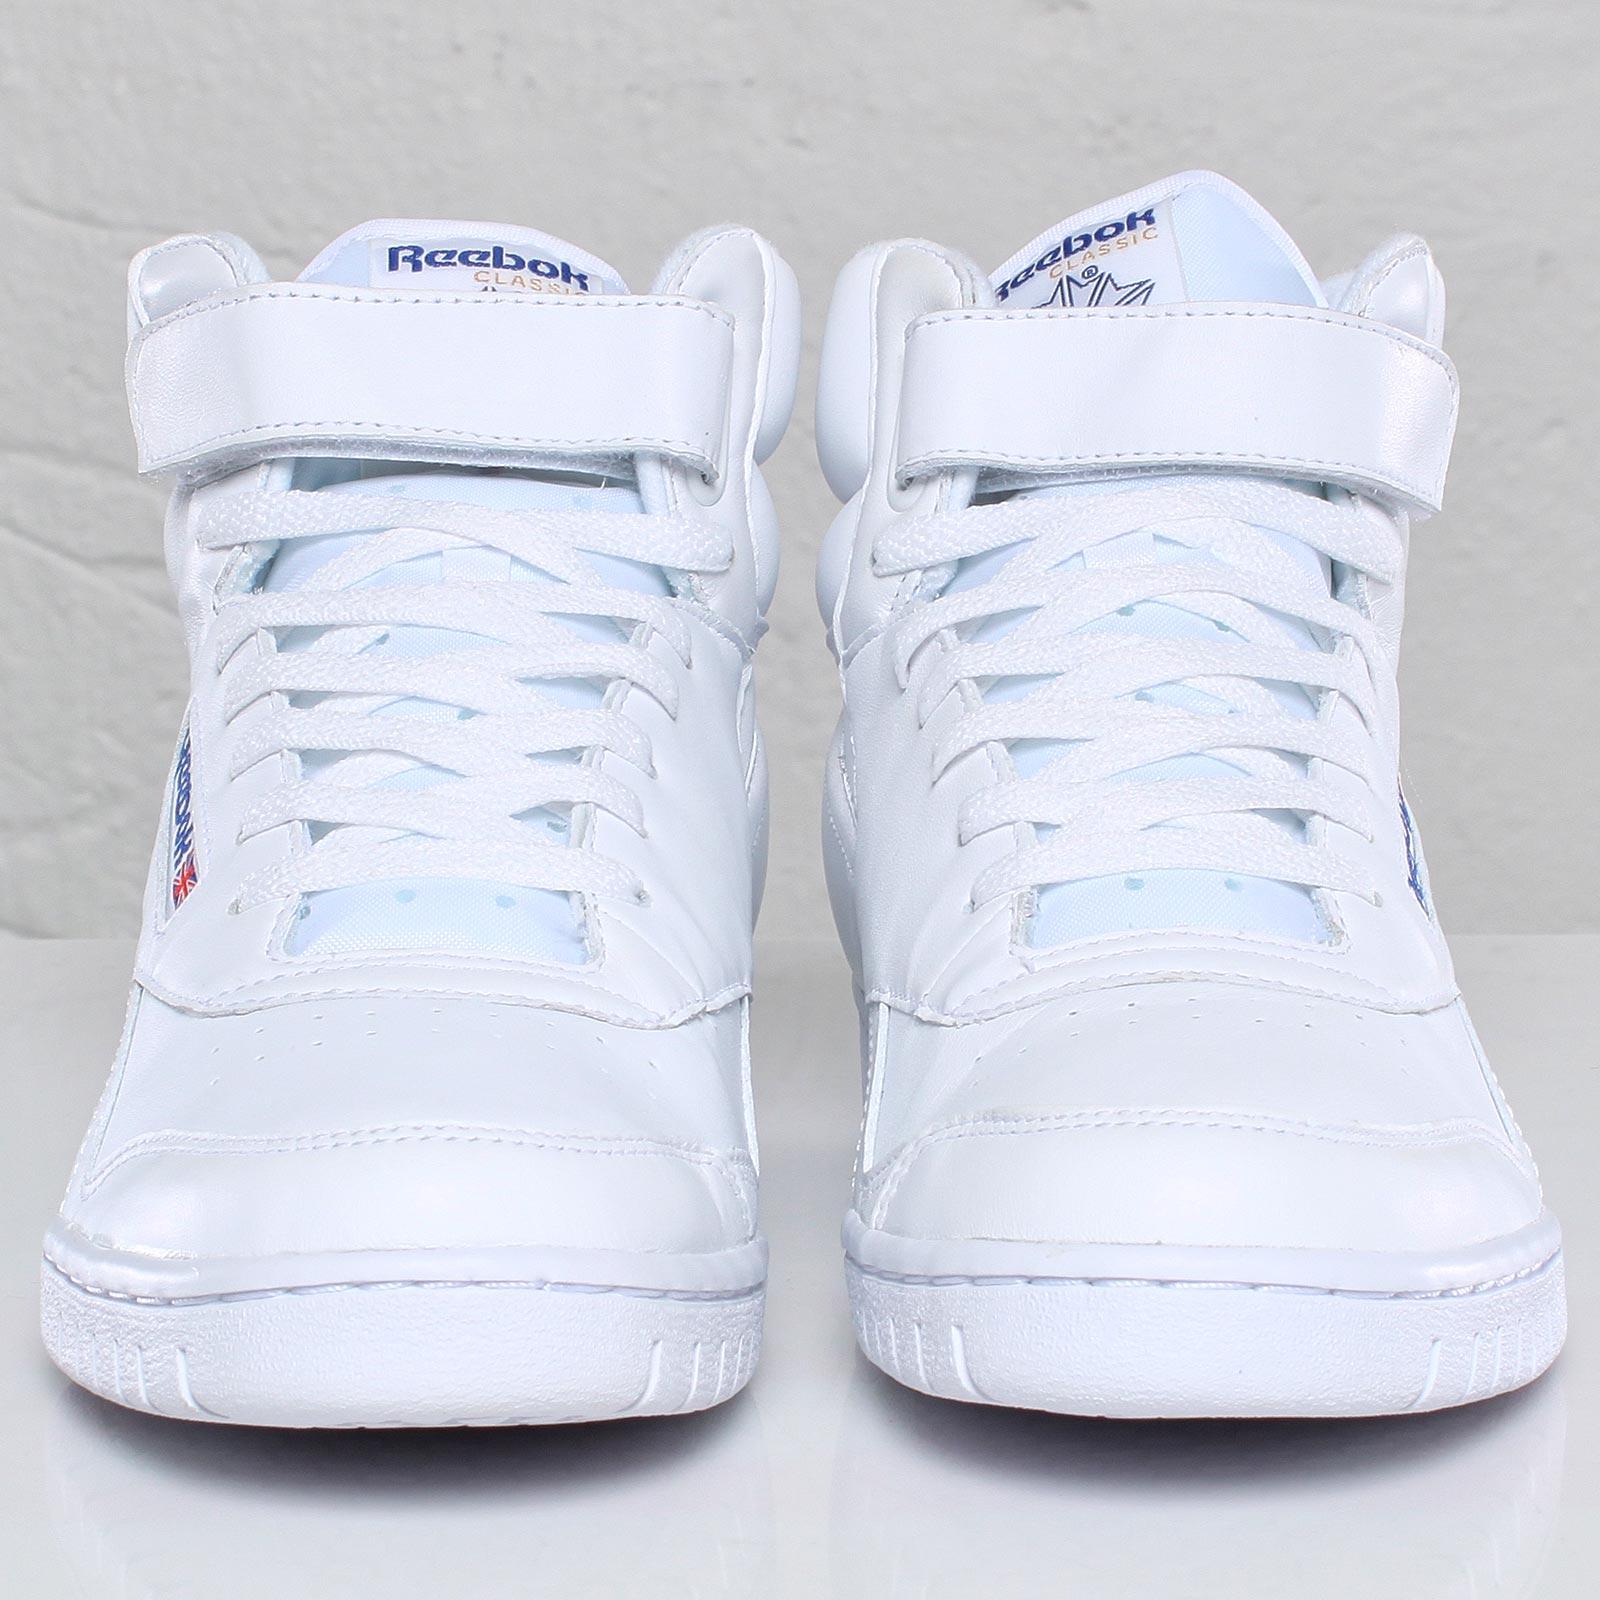 59cc6097863 Reebok Ex-O-Fit High - 81011 - Sneakersnstuff